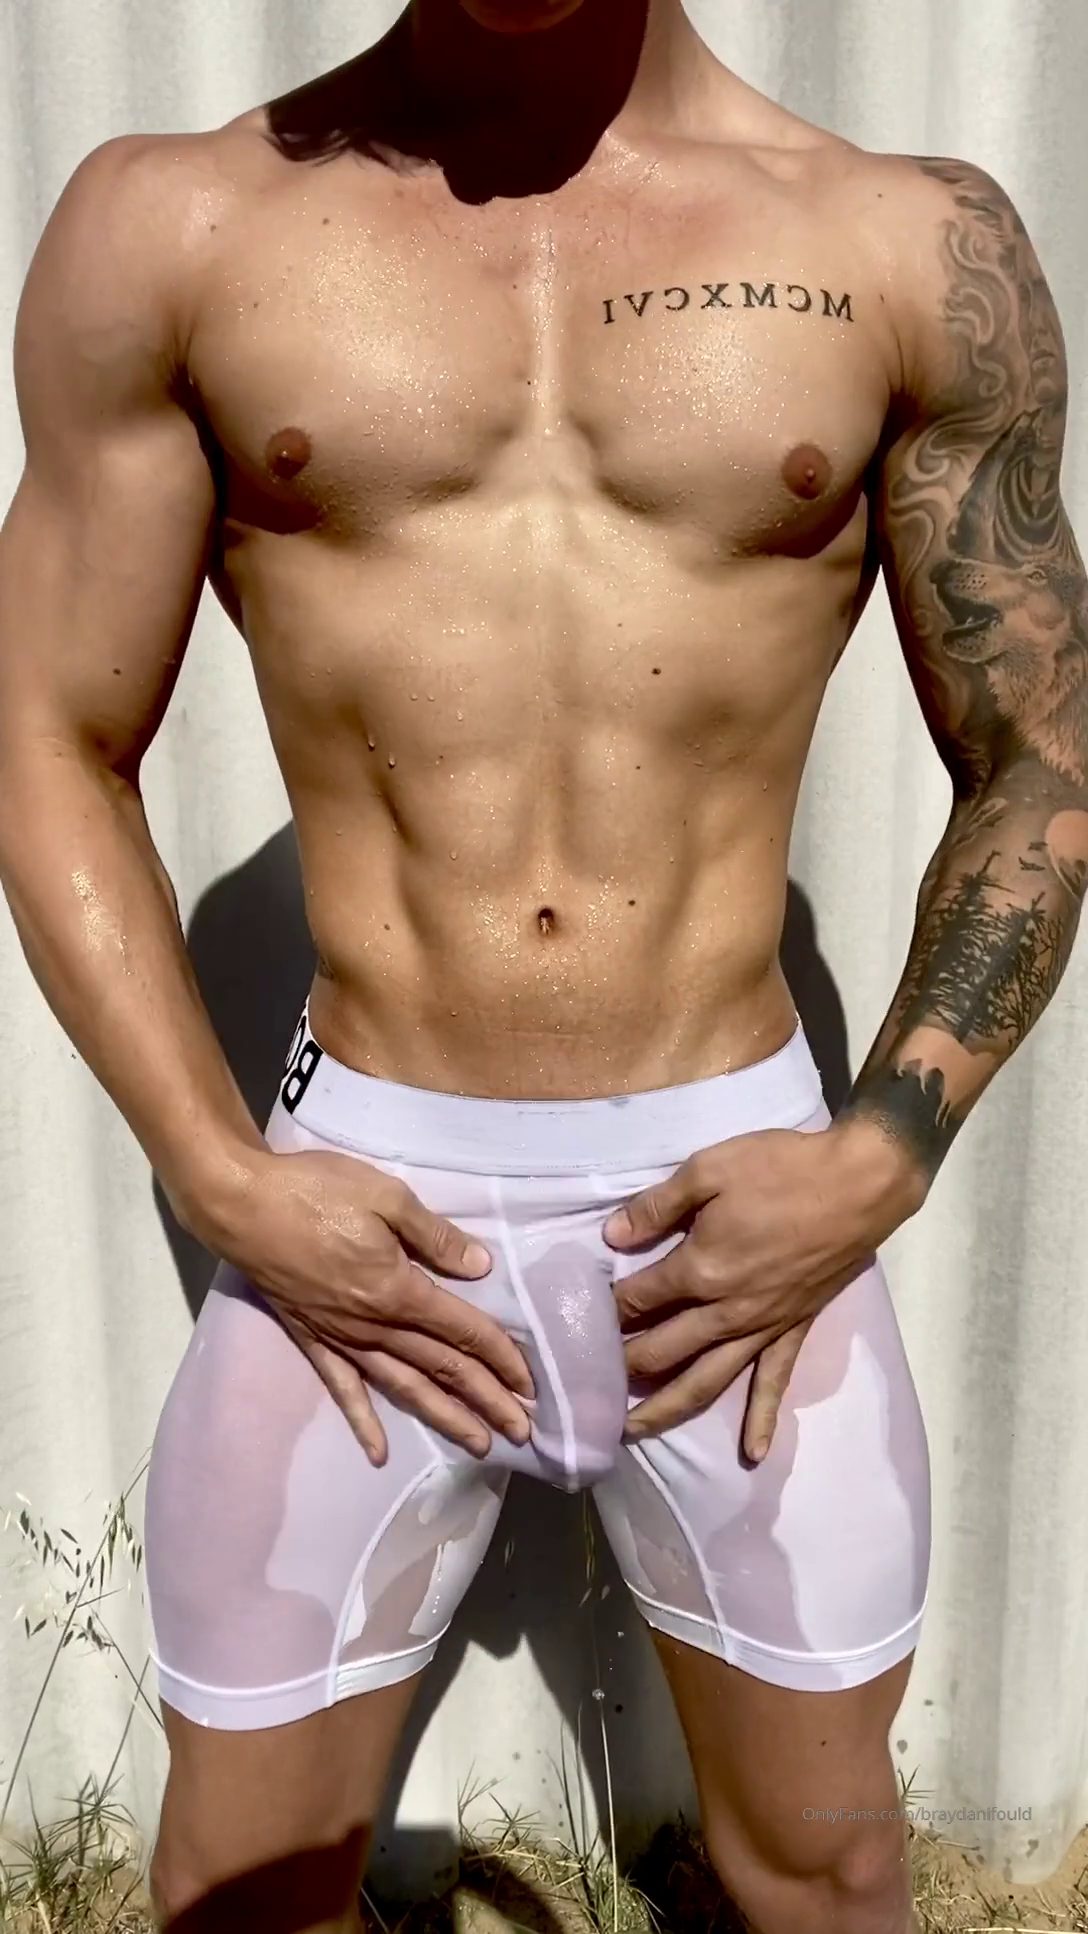 Hot Australian covering himself in water